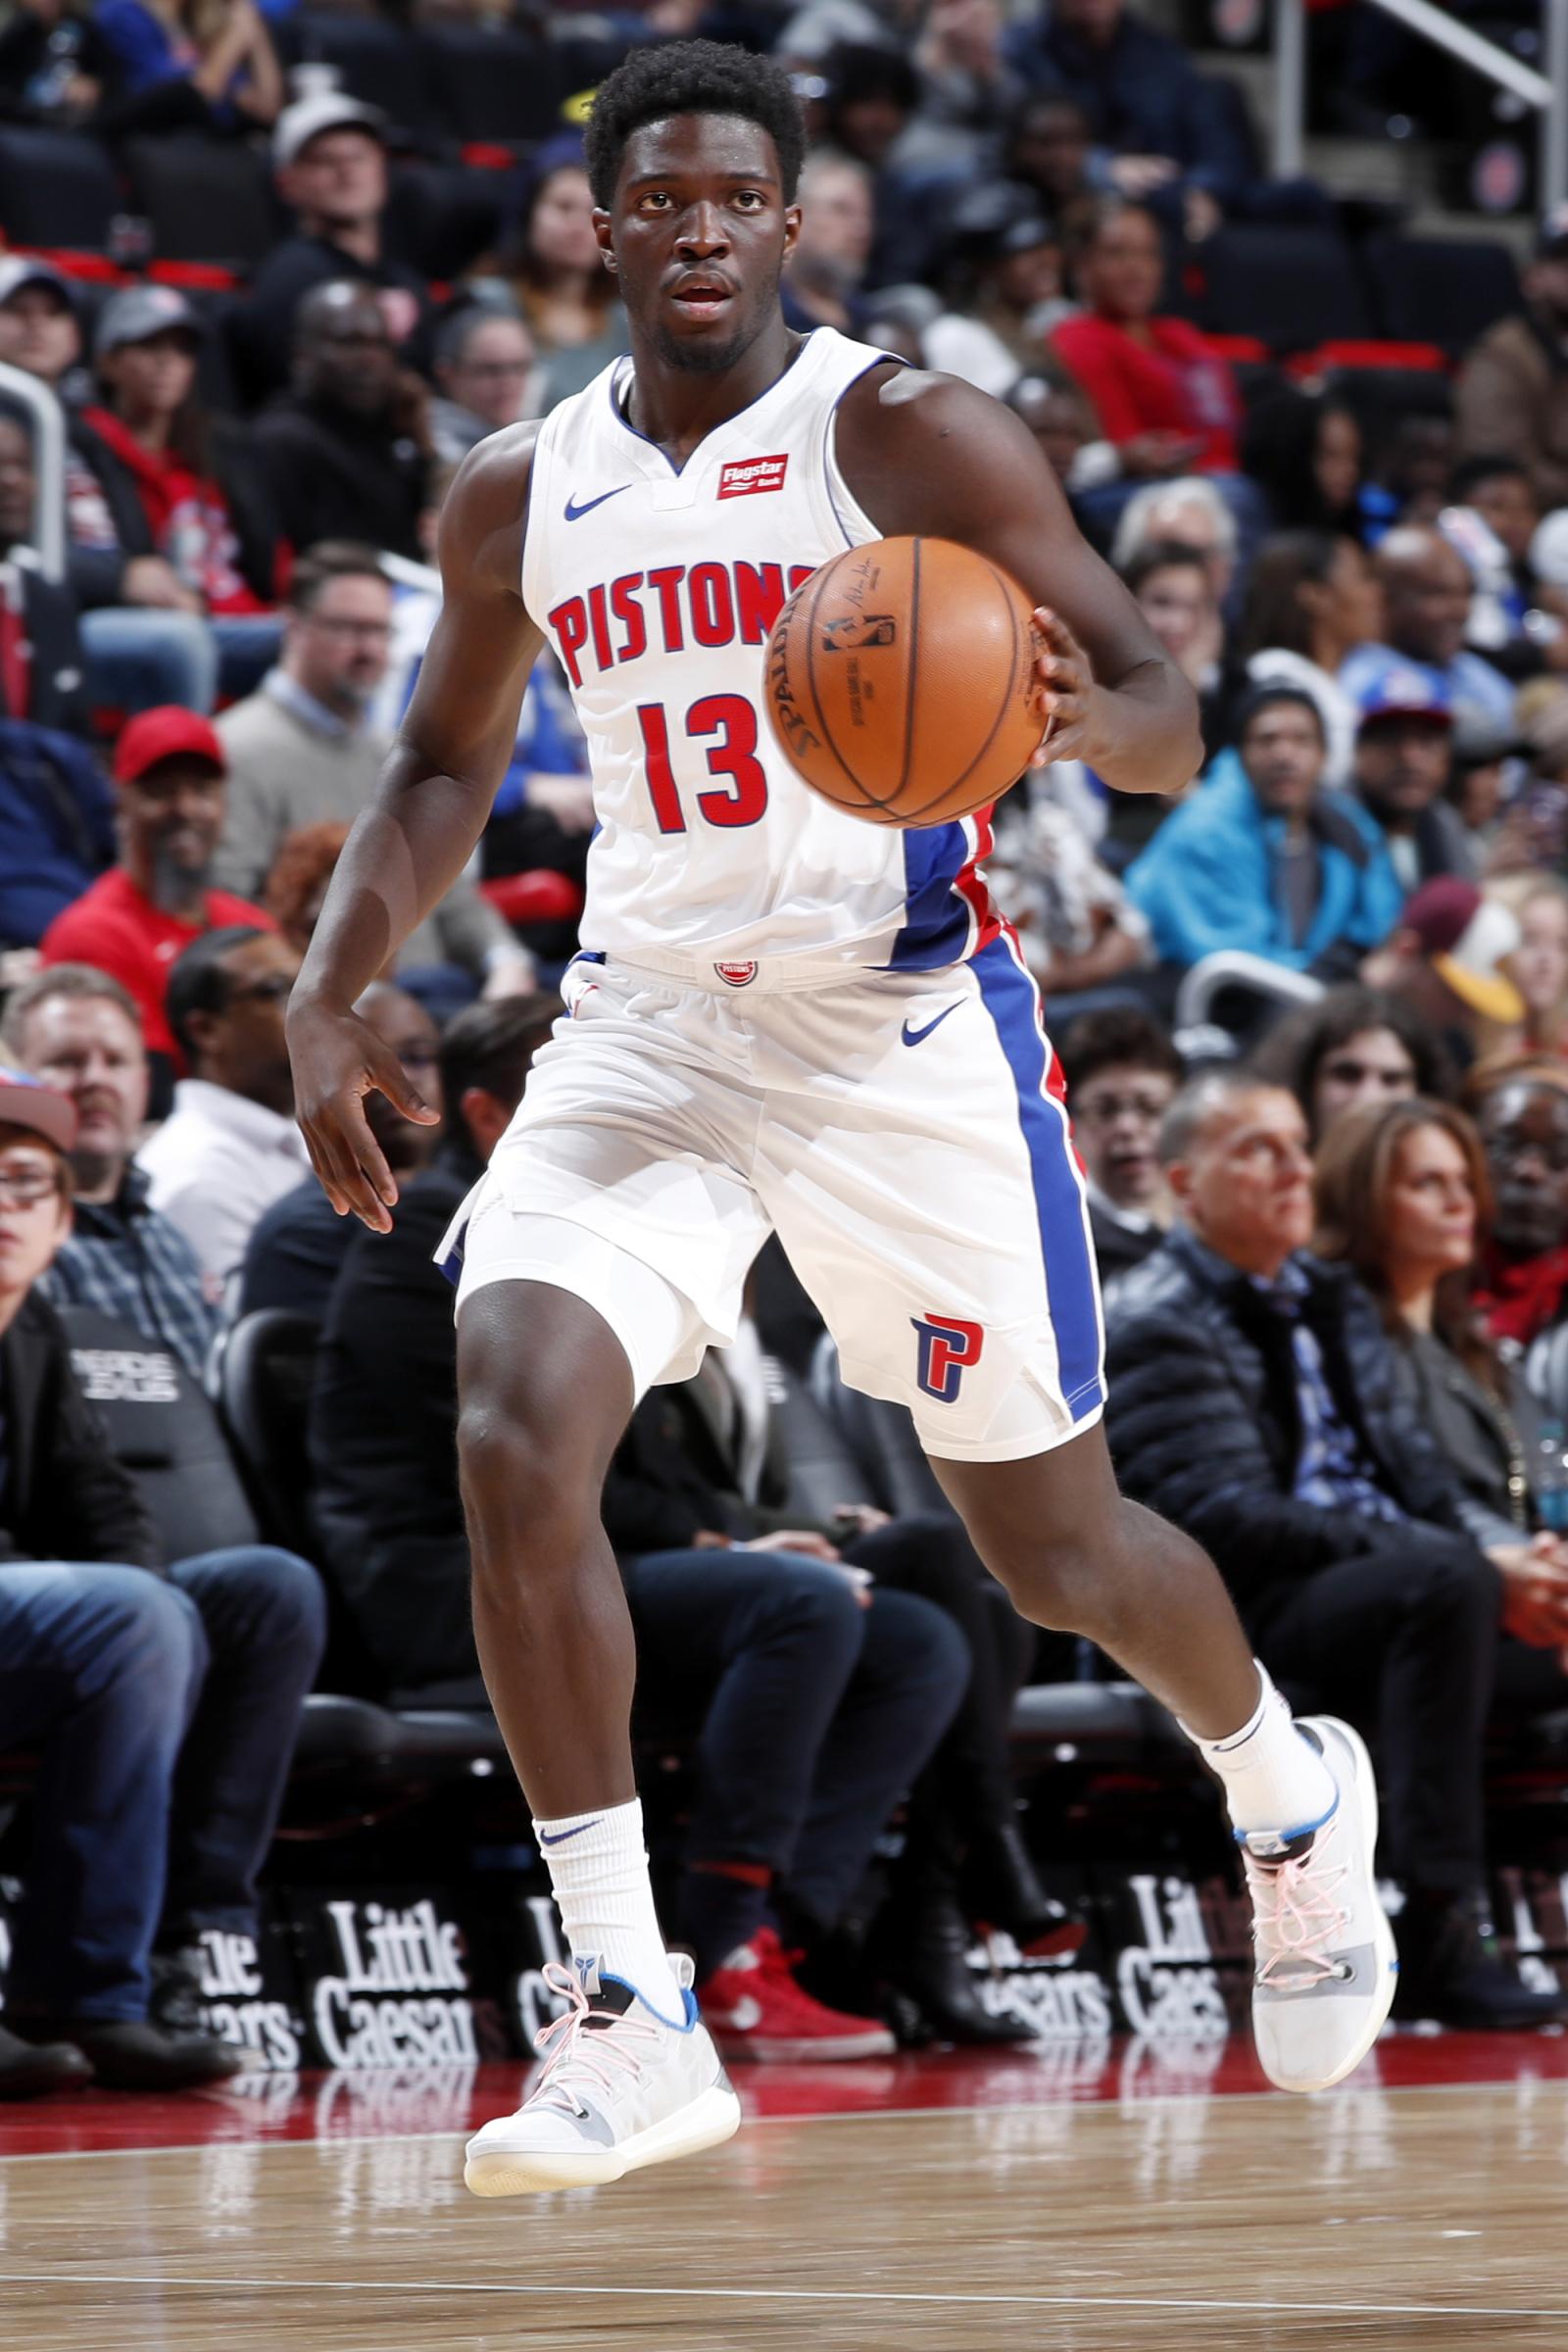 2018-19 Detroit Pistons season review: Khyri Thomas